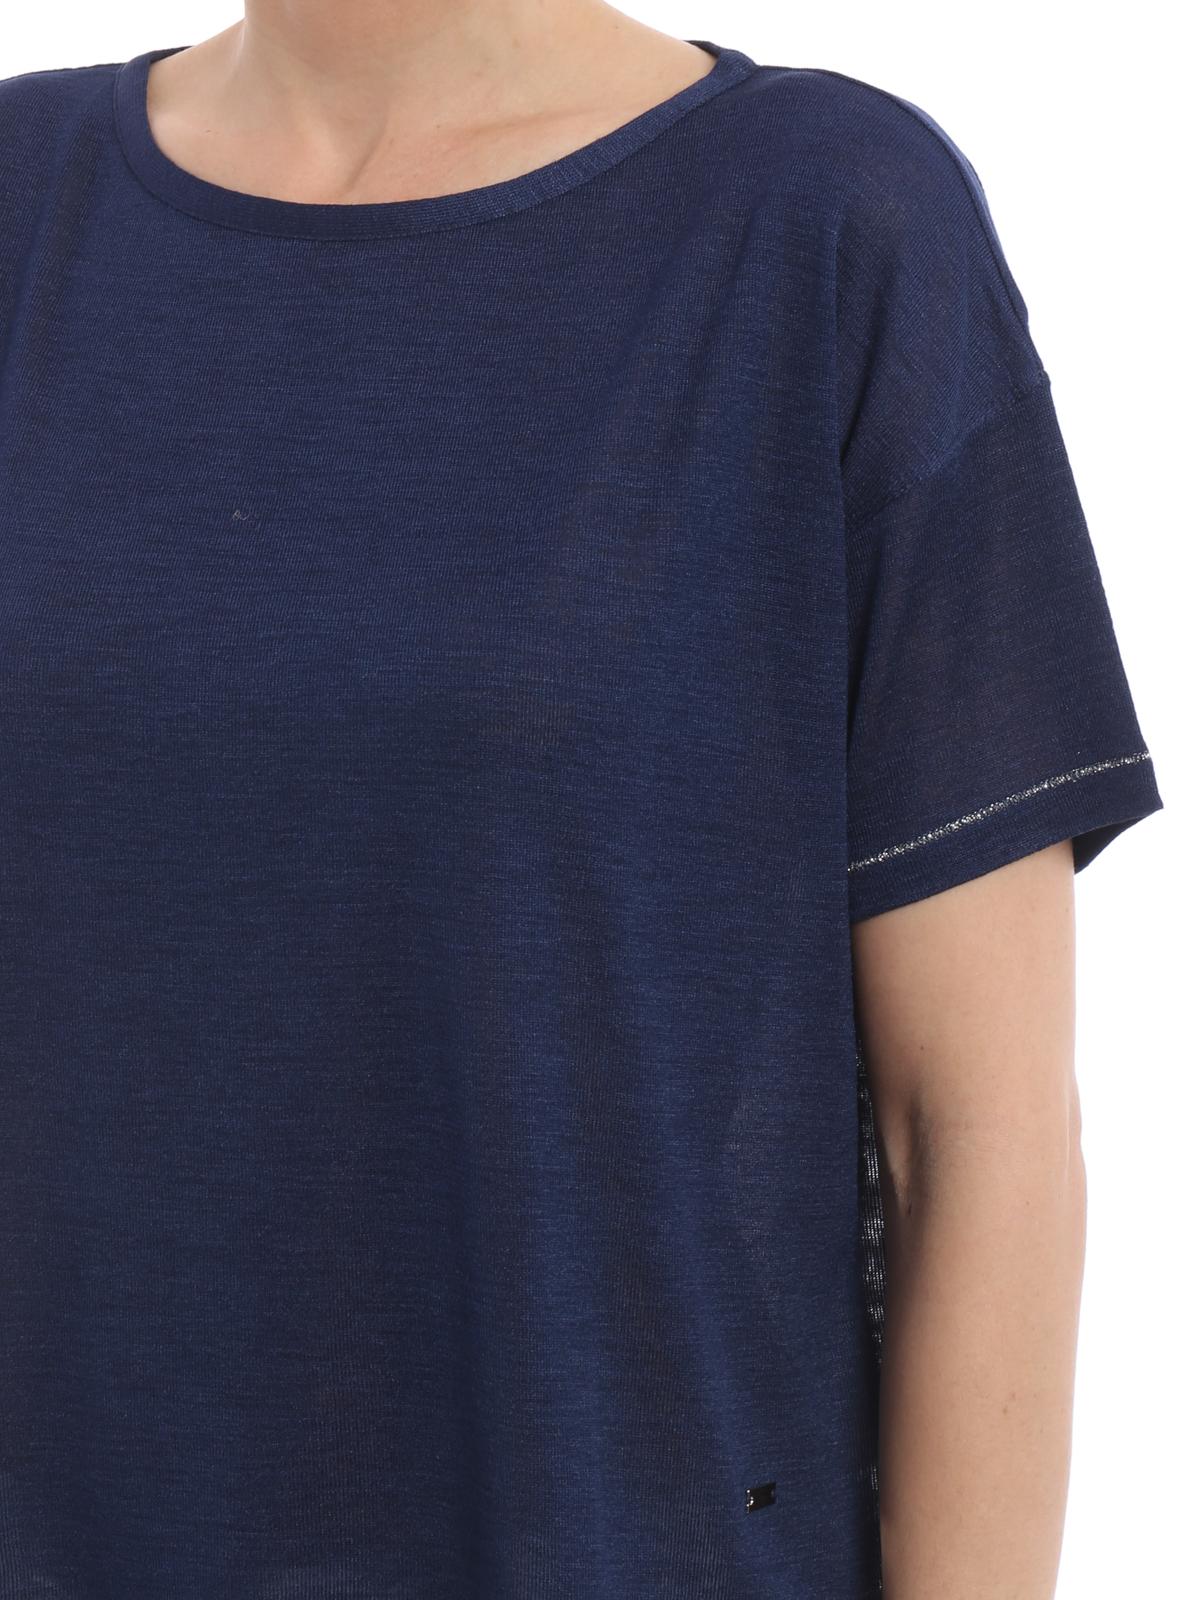 Silk Jersey Boxy T Shirt By Fay Boat Necks Shop Online